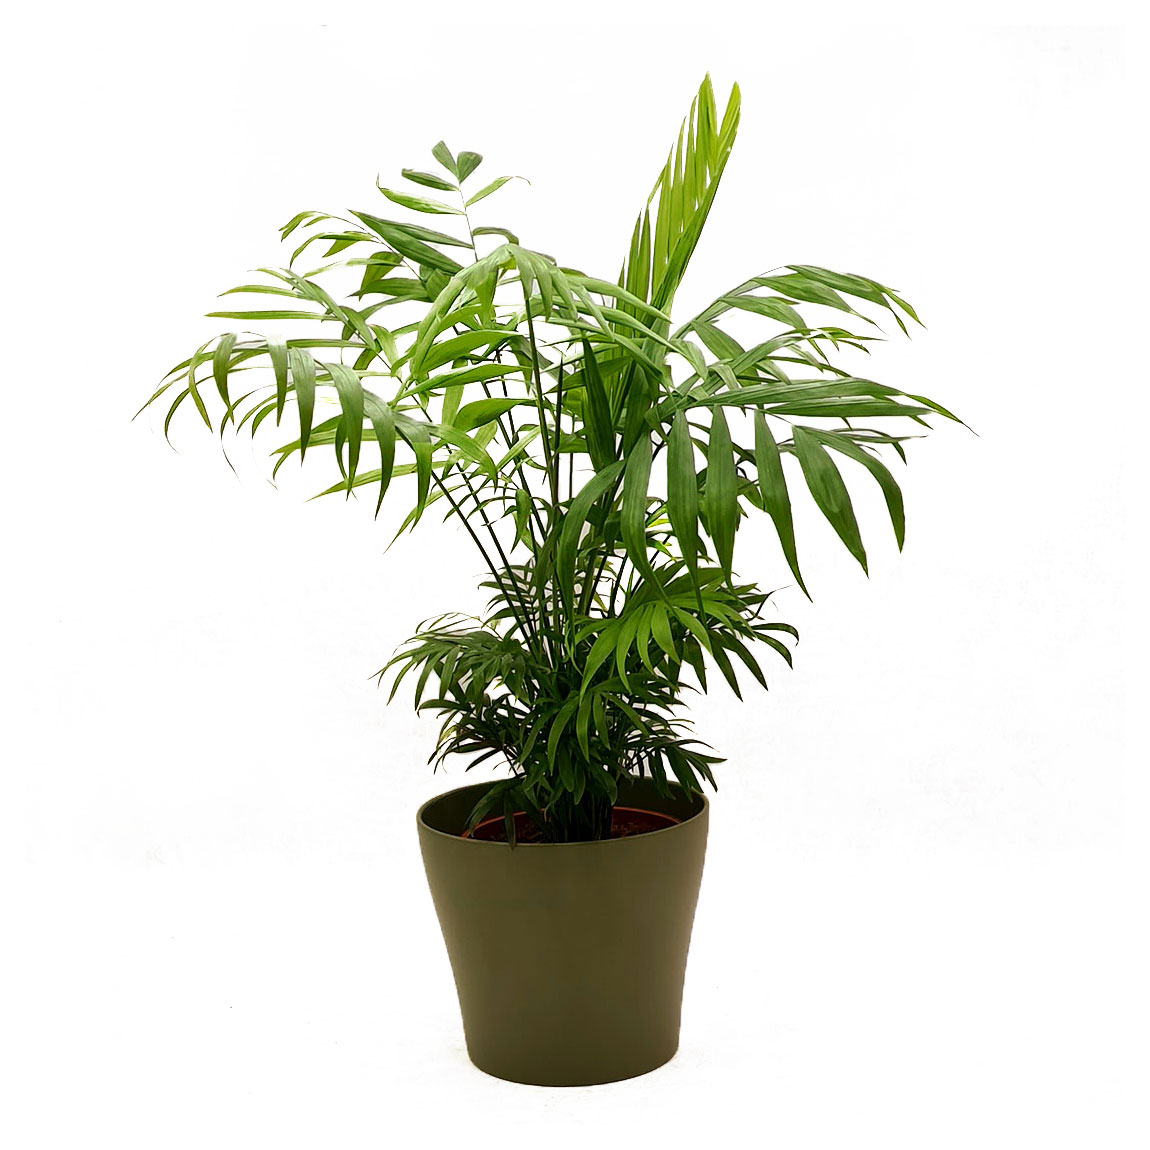 Vazoninis augalas CHAMEDORĖJA (CHAMAEDOREA), be vazono